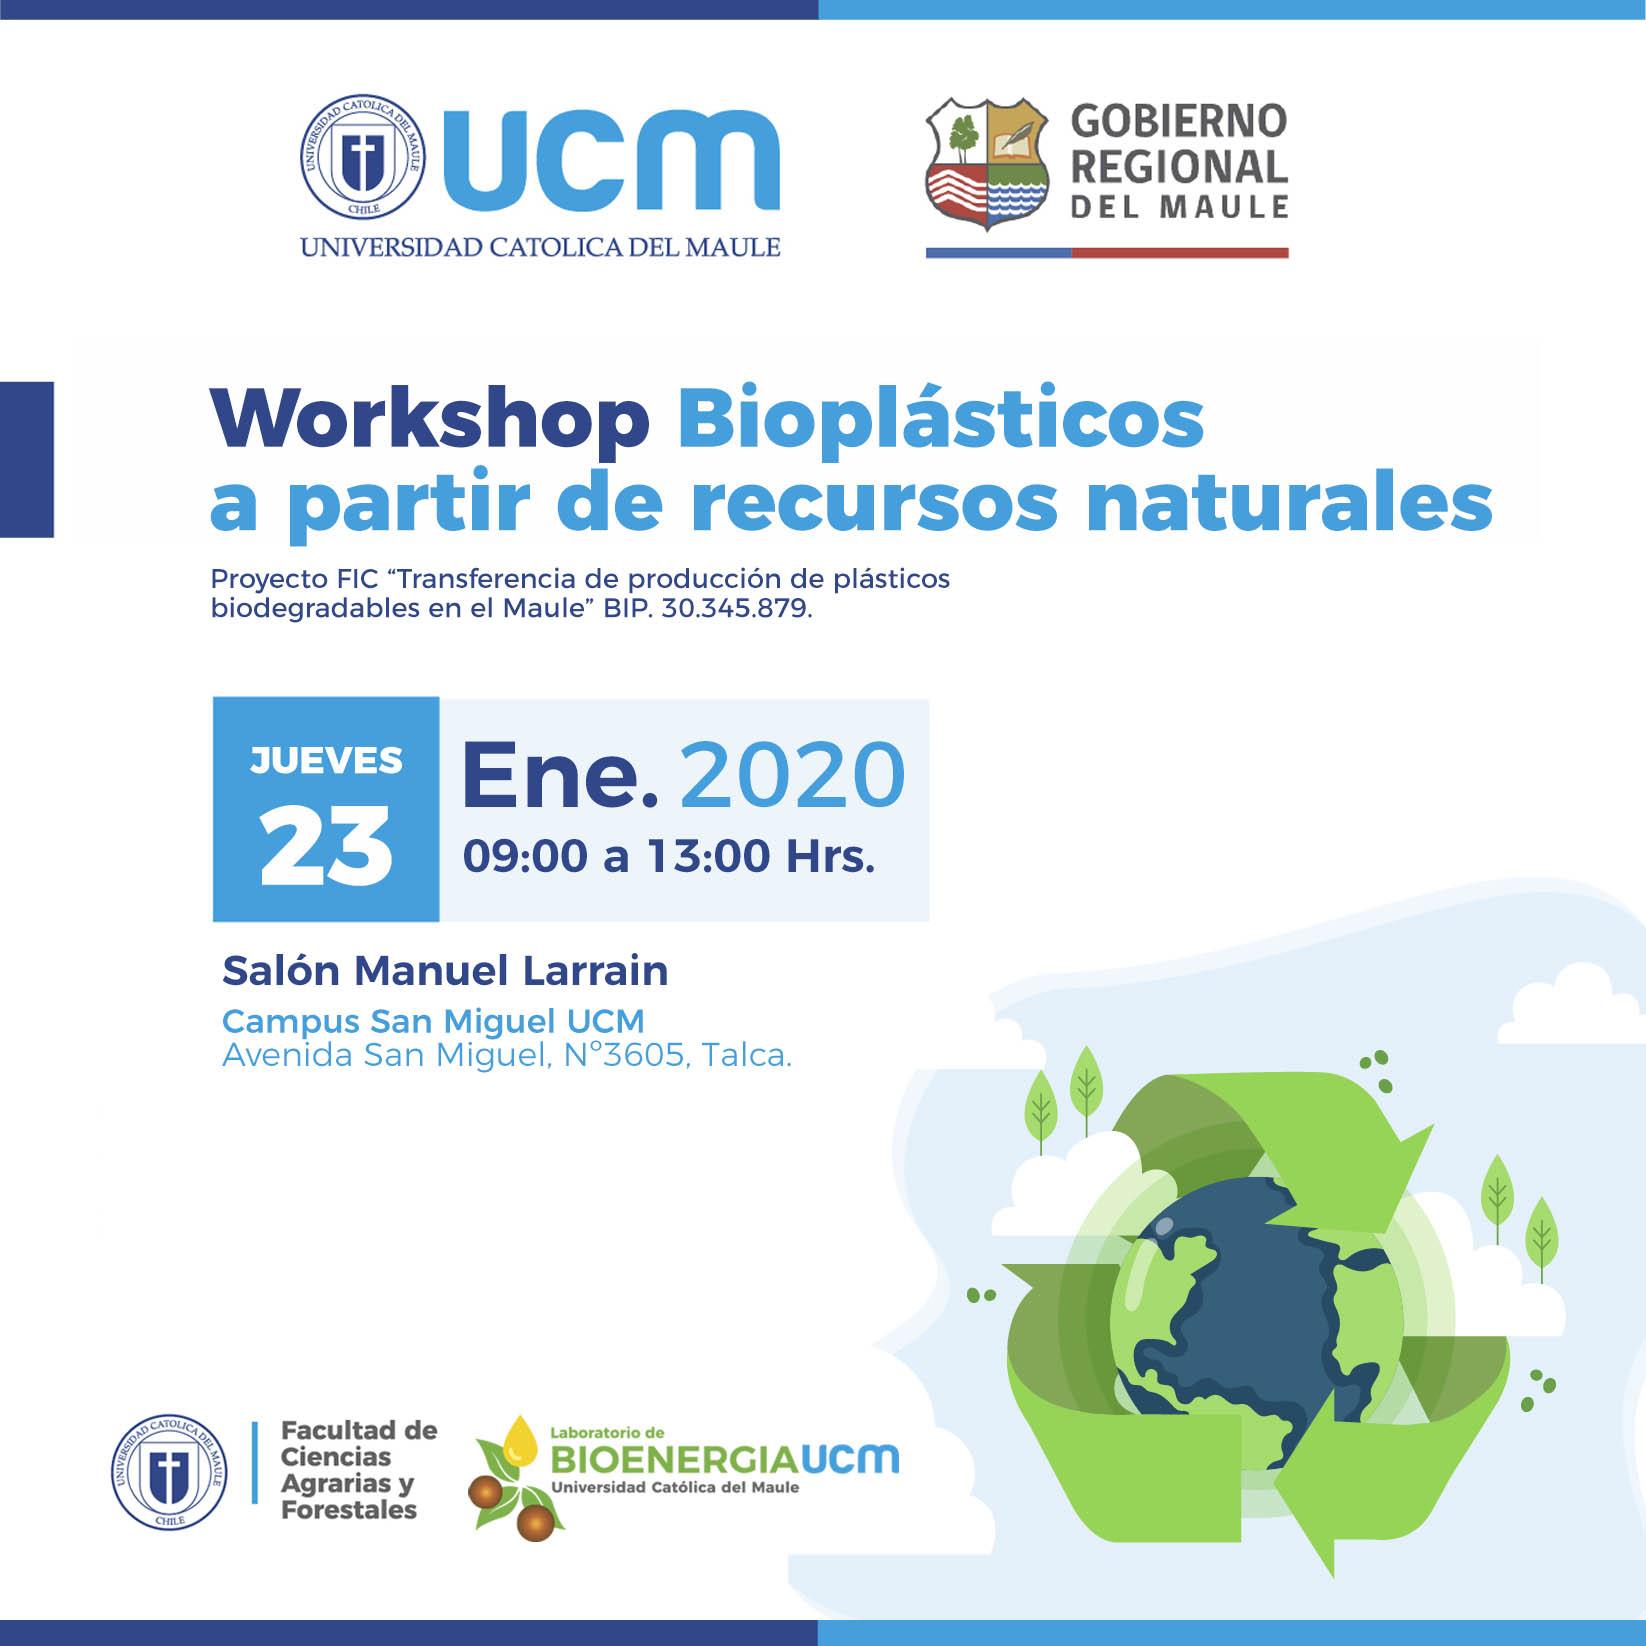 UCM invita a participar de Workshop sobre Bioplásticos